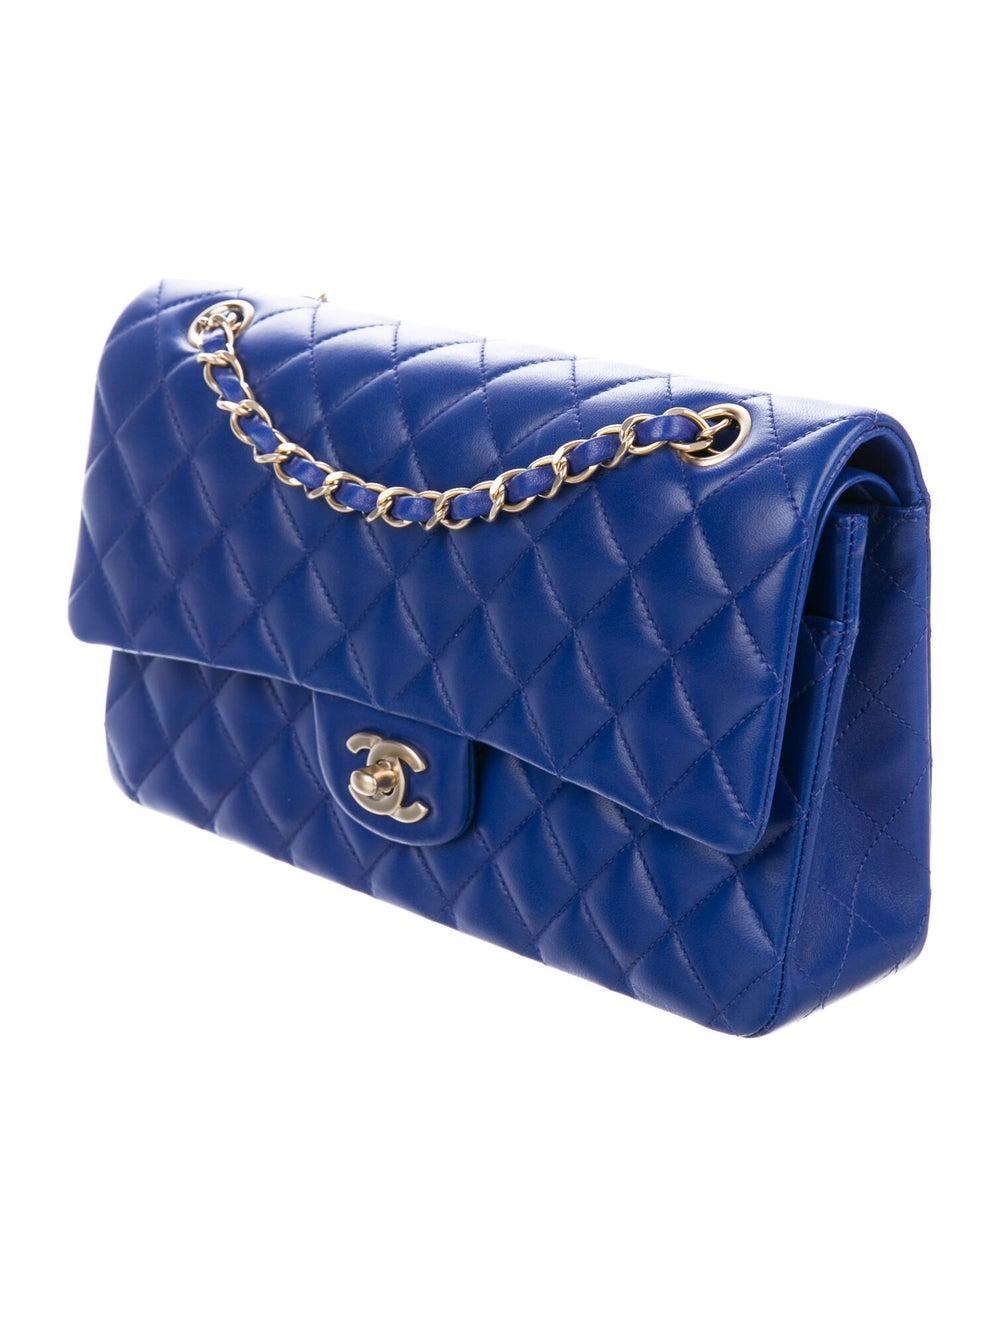 Chanel Medium Classic Double Flap Bag Blue - image 3